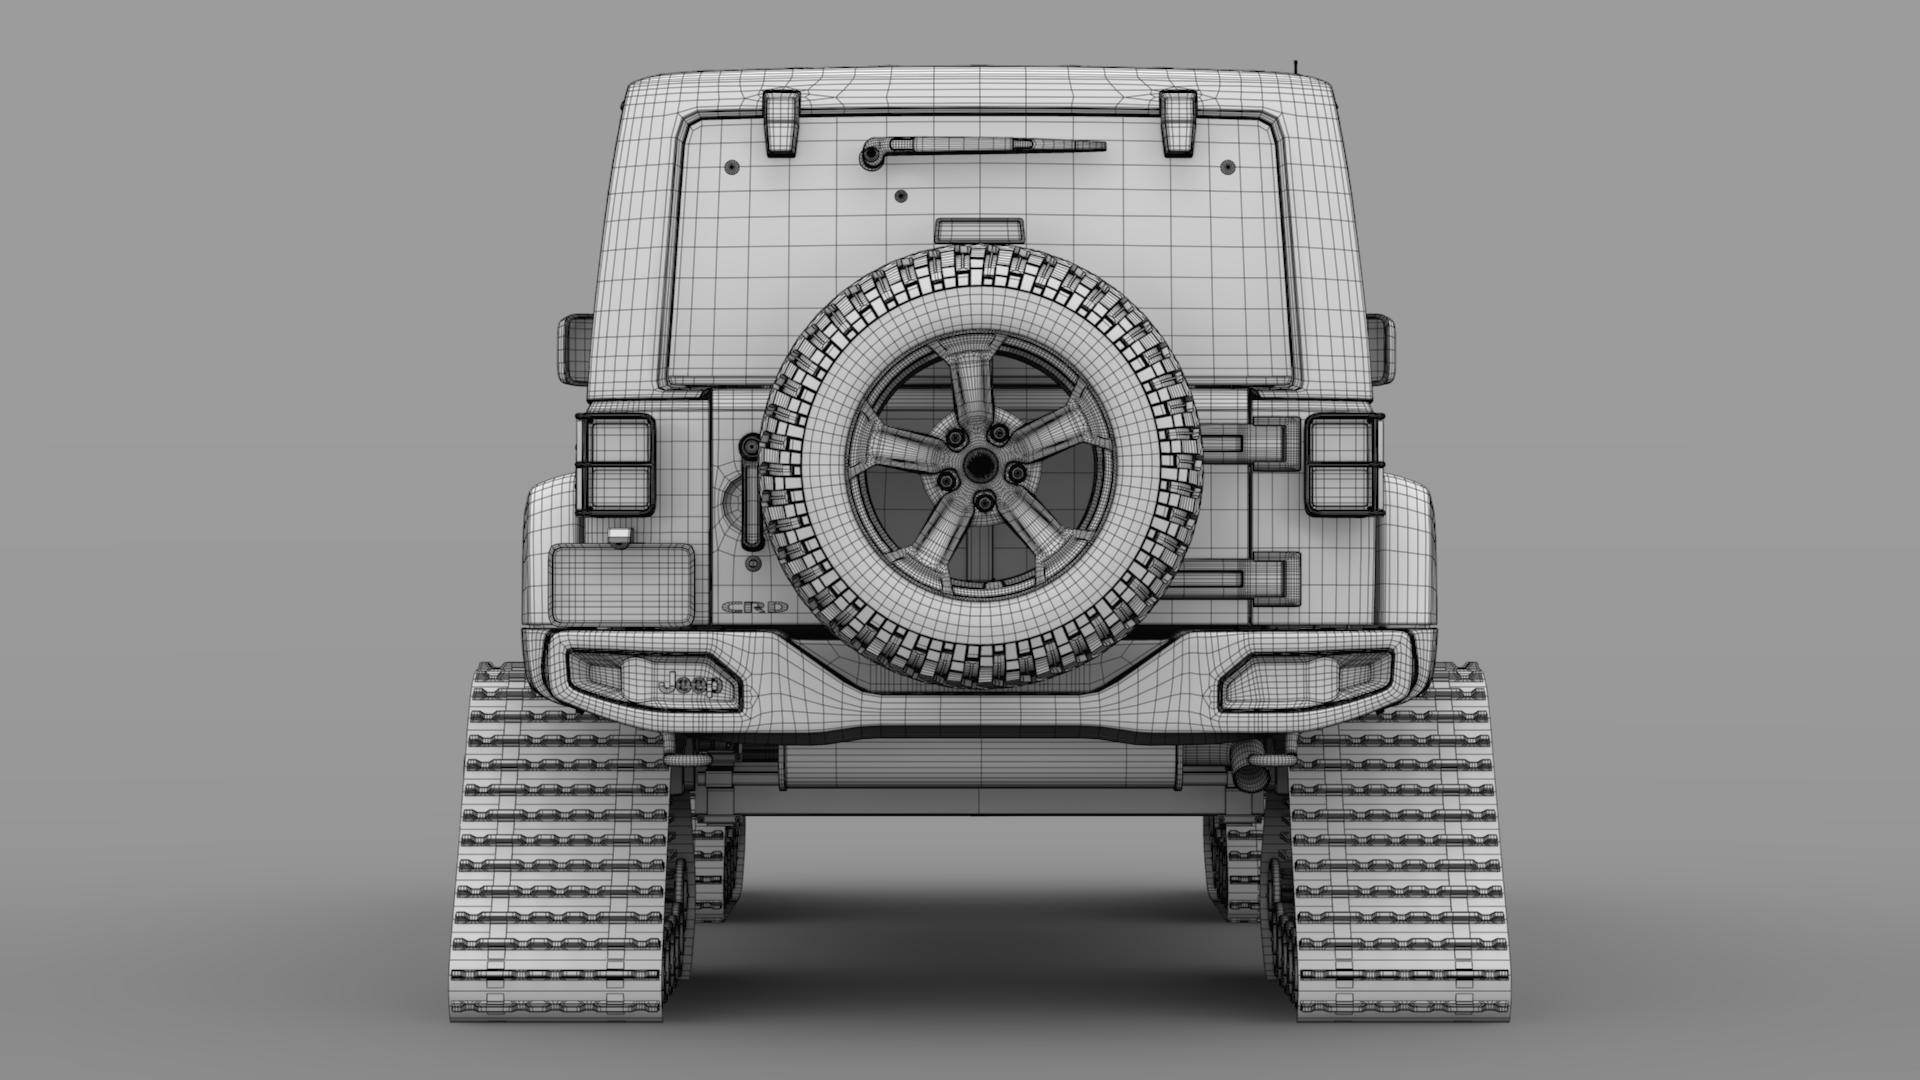 jeep wrangler crawler rubicon recon jk 2017 3d model max fbx c4d lwo ma mb hrc xsi obj 276922